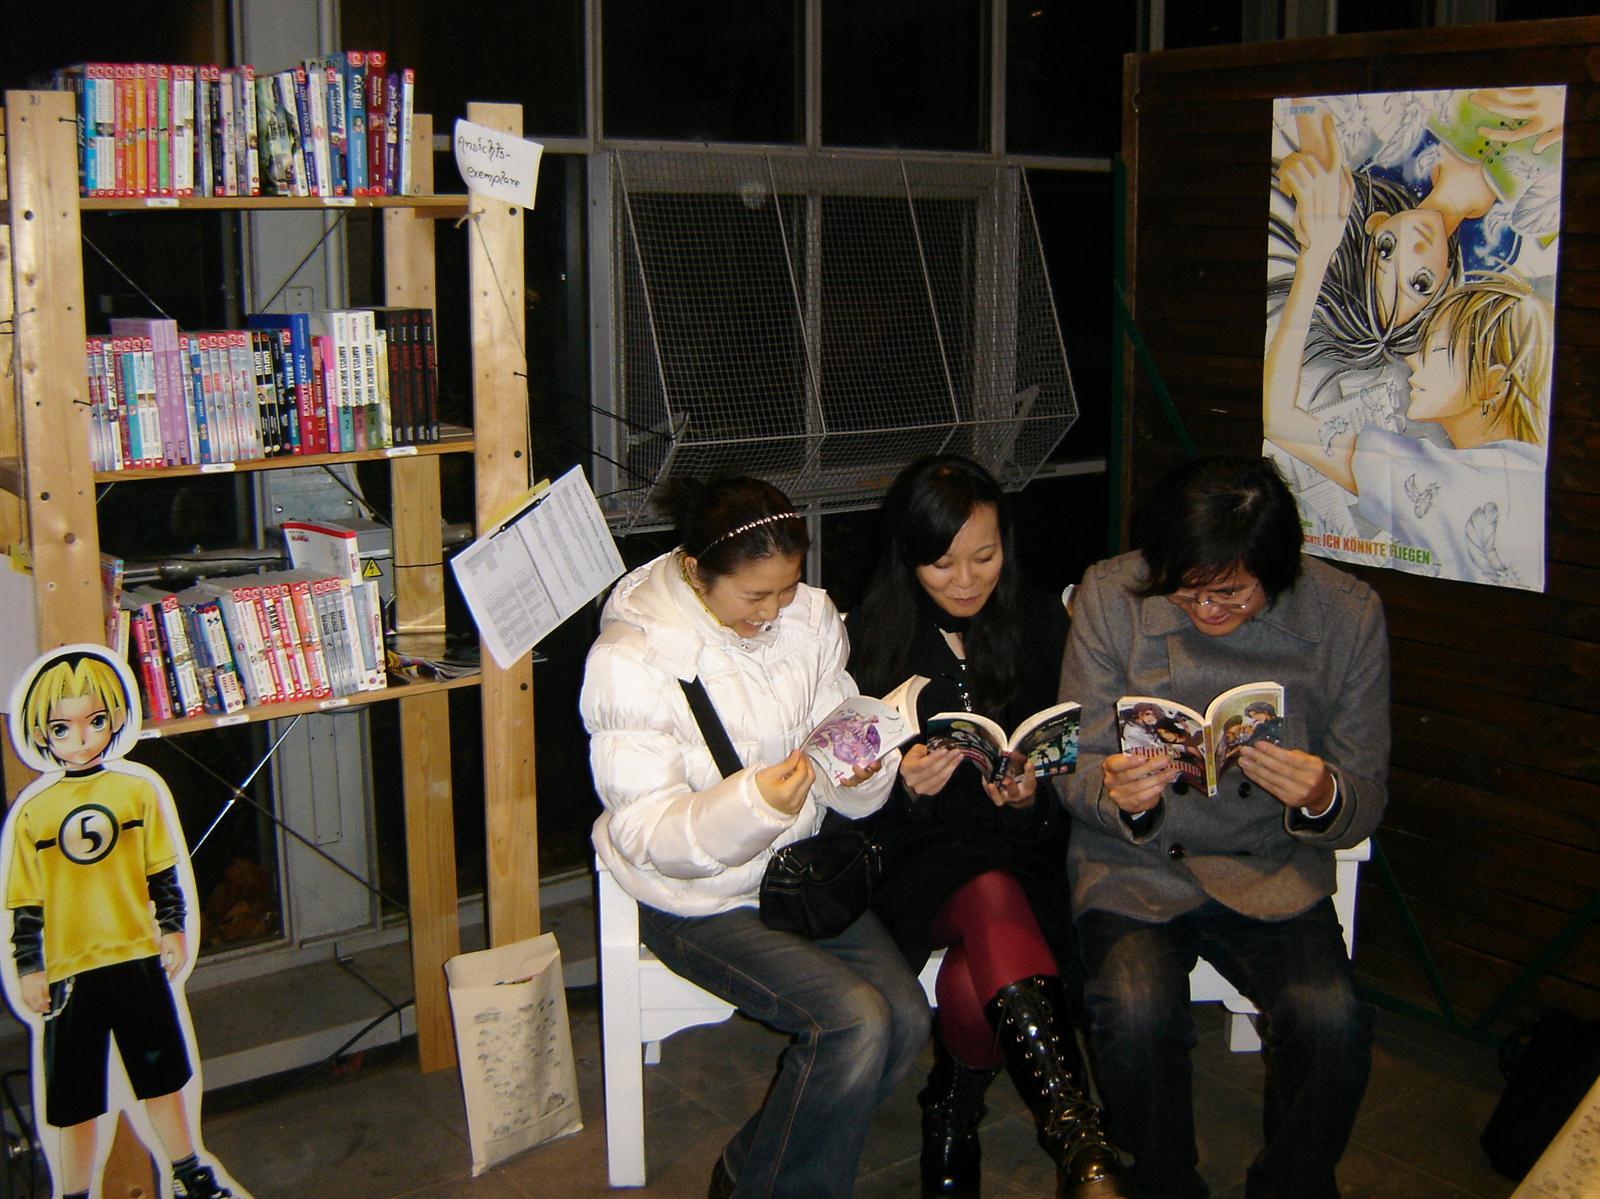 Japan_Week_2011_Wie.MAI.KAI_Leseecke_Palmengarten_wmk_009